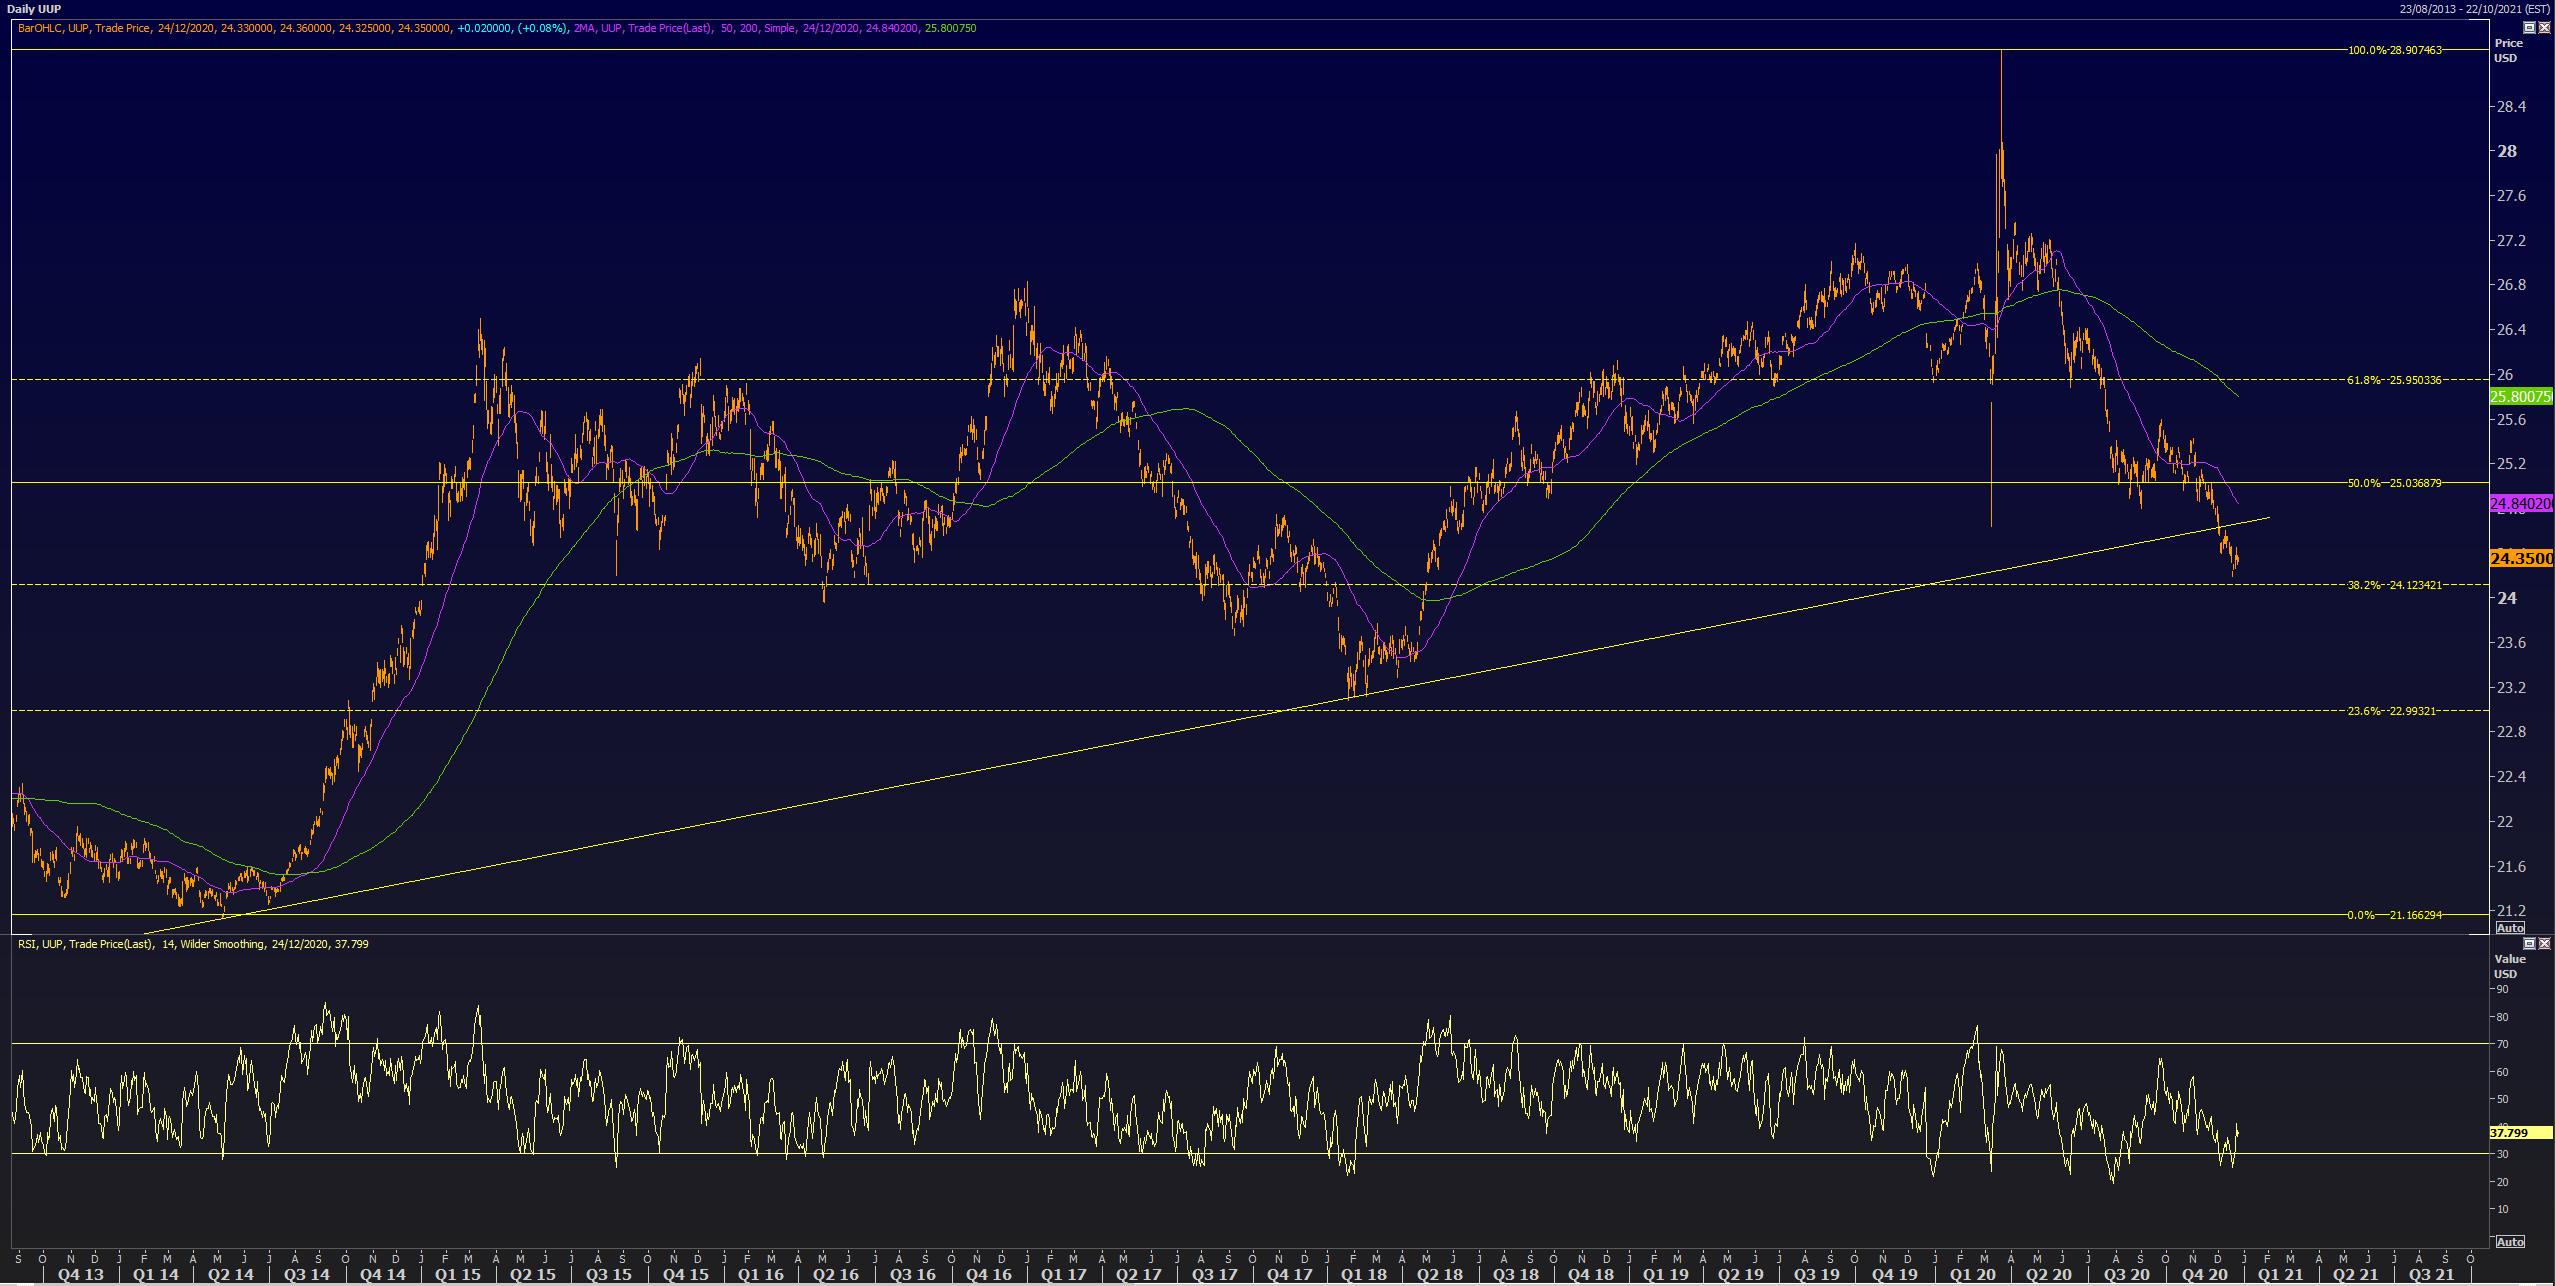 usdt无需实名(caibao.it):从高点重挫13%后,明年1月美元将最先逆袭? 第5张